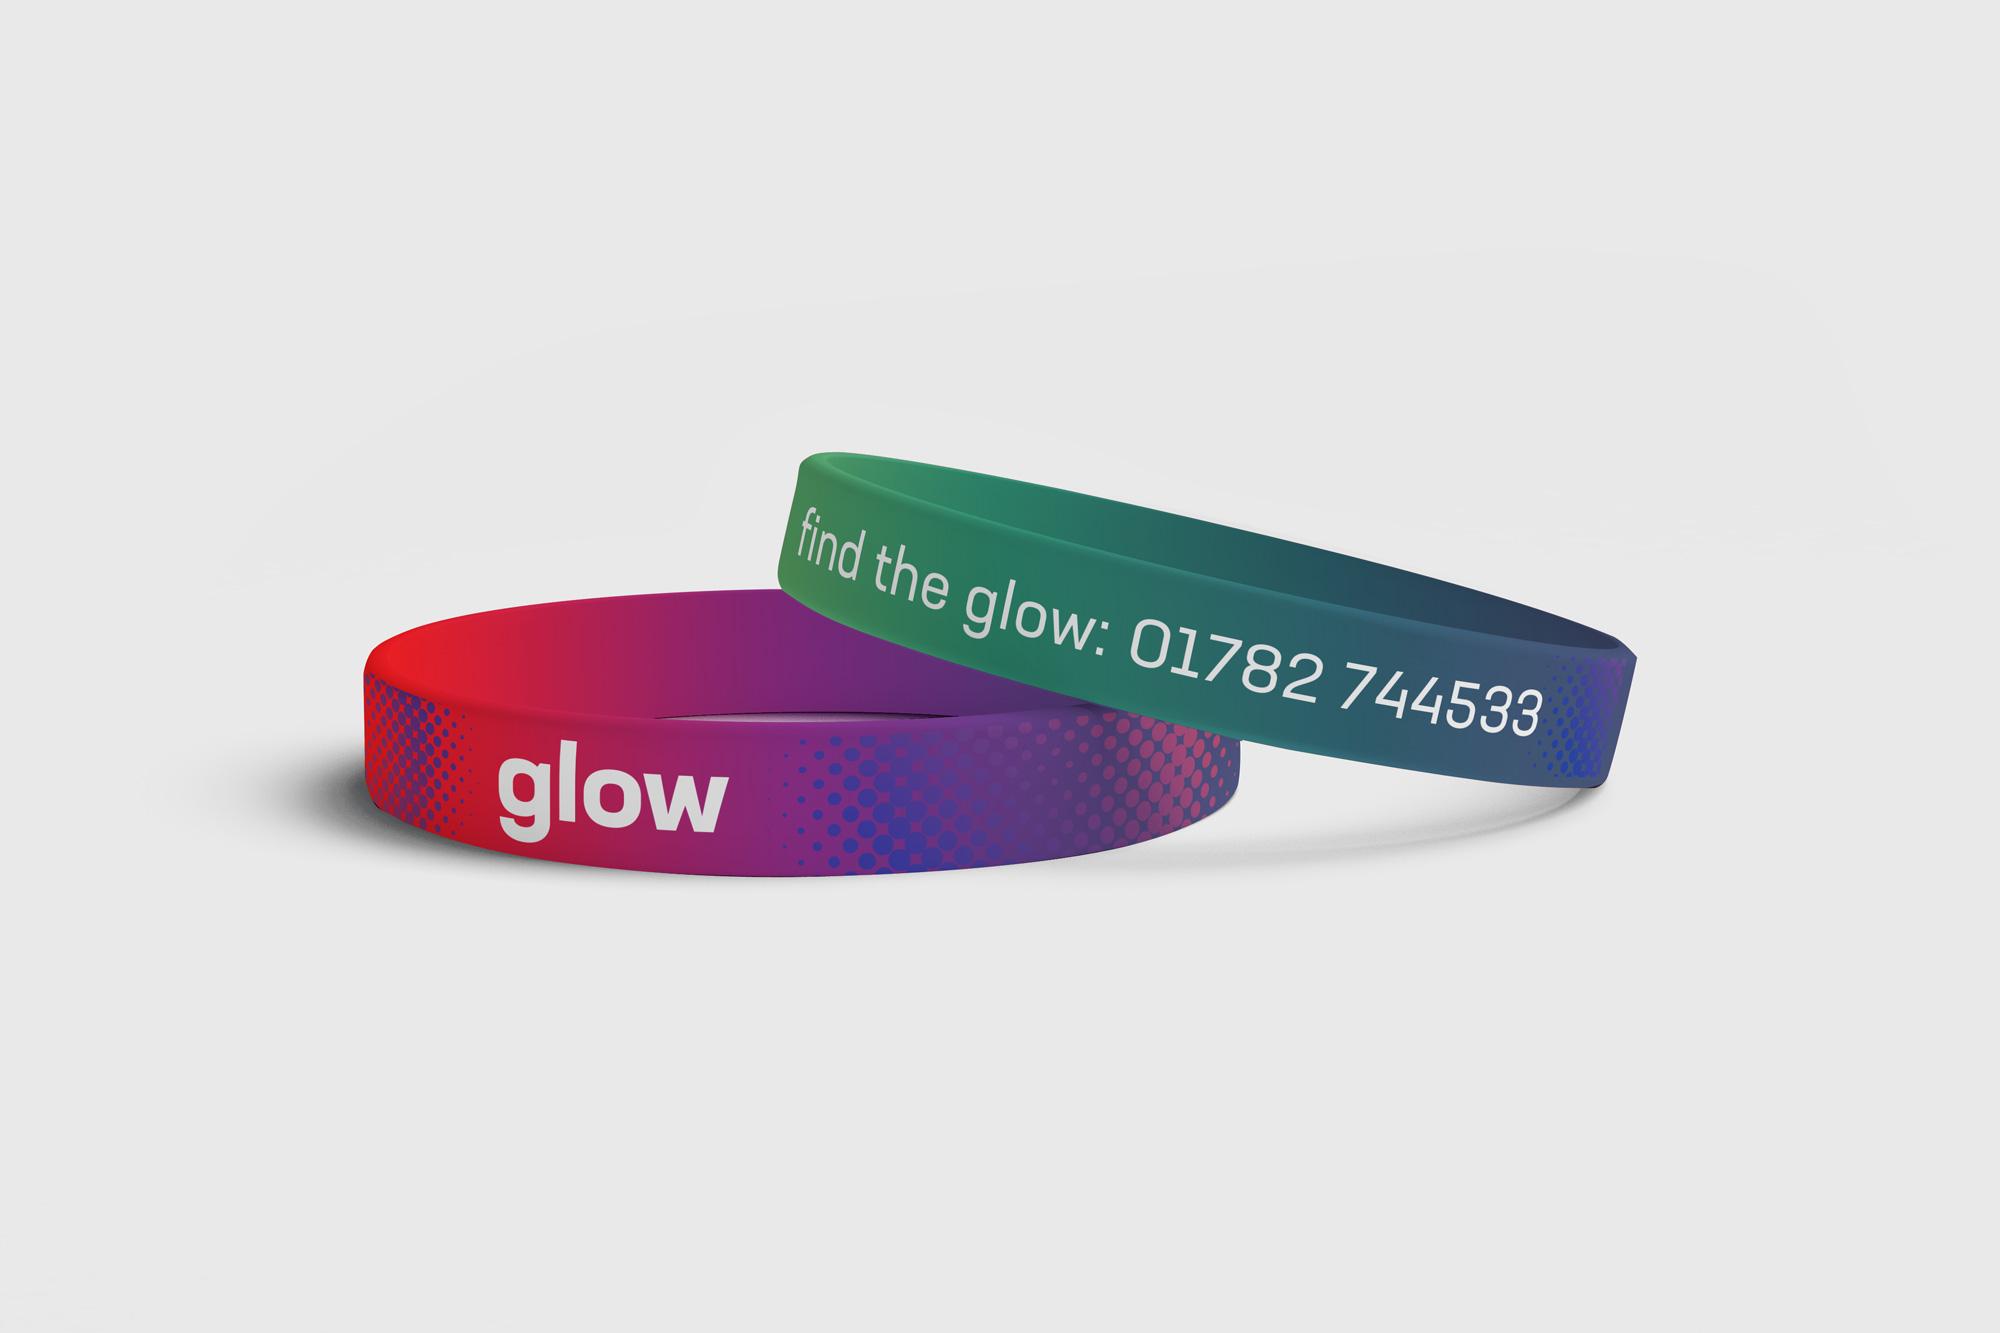 Glow fundraising wristbands